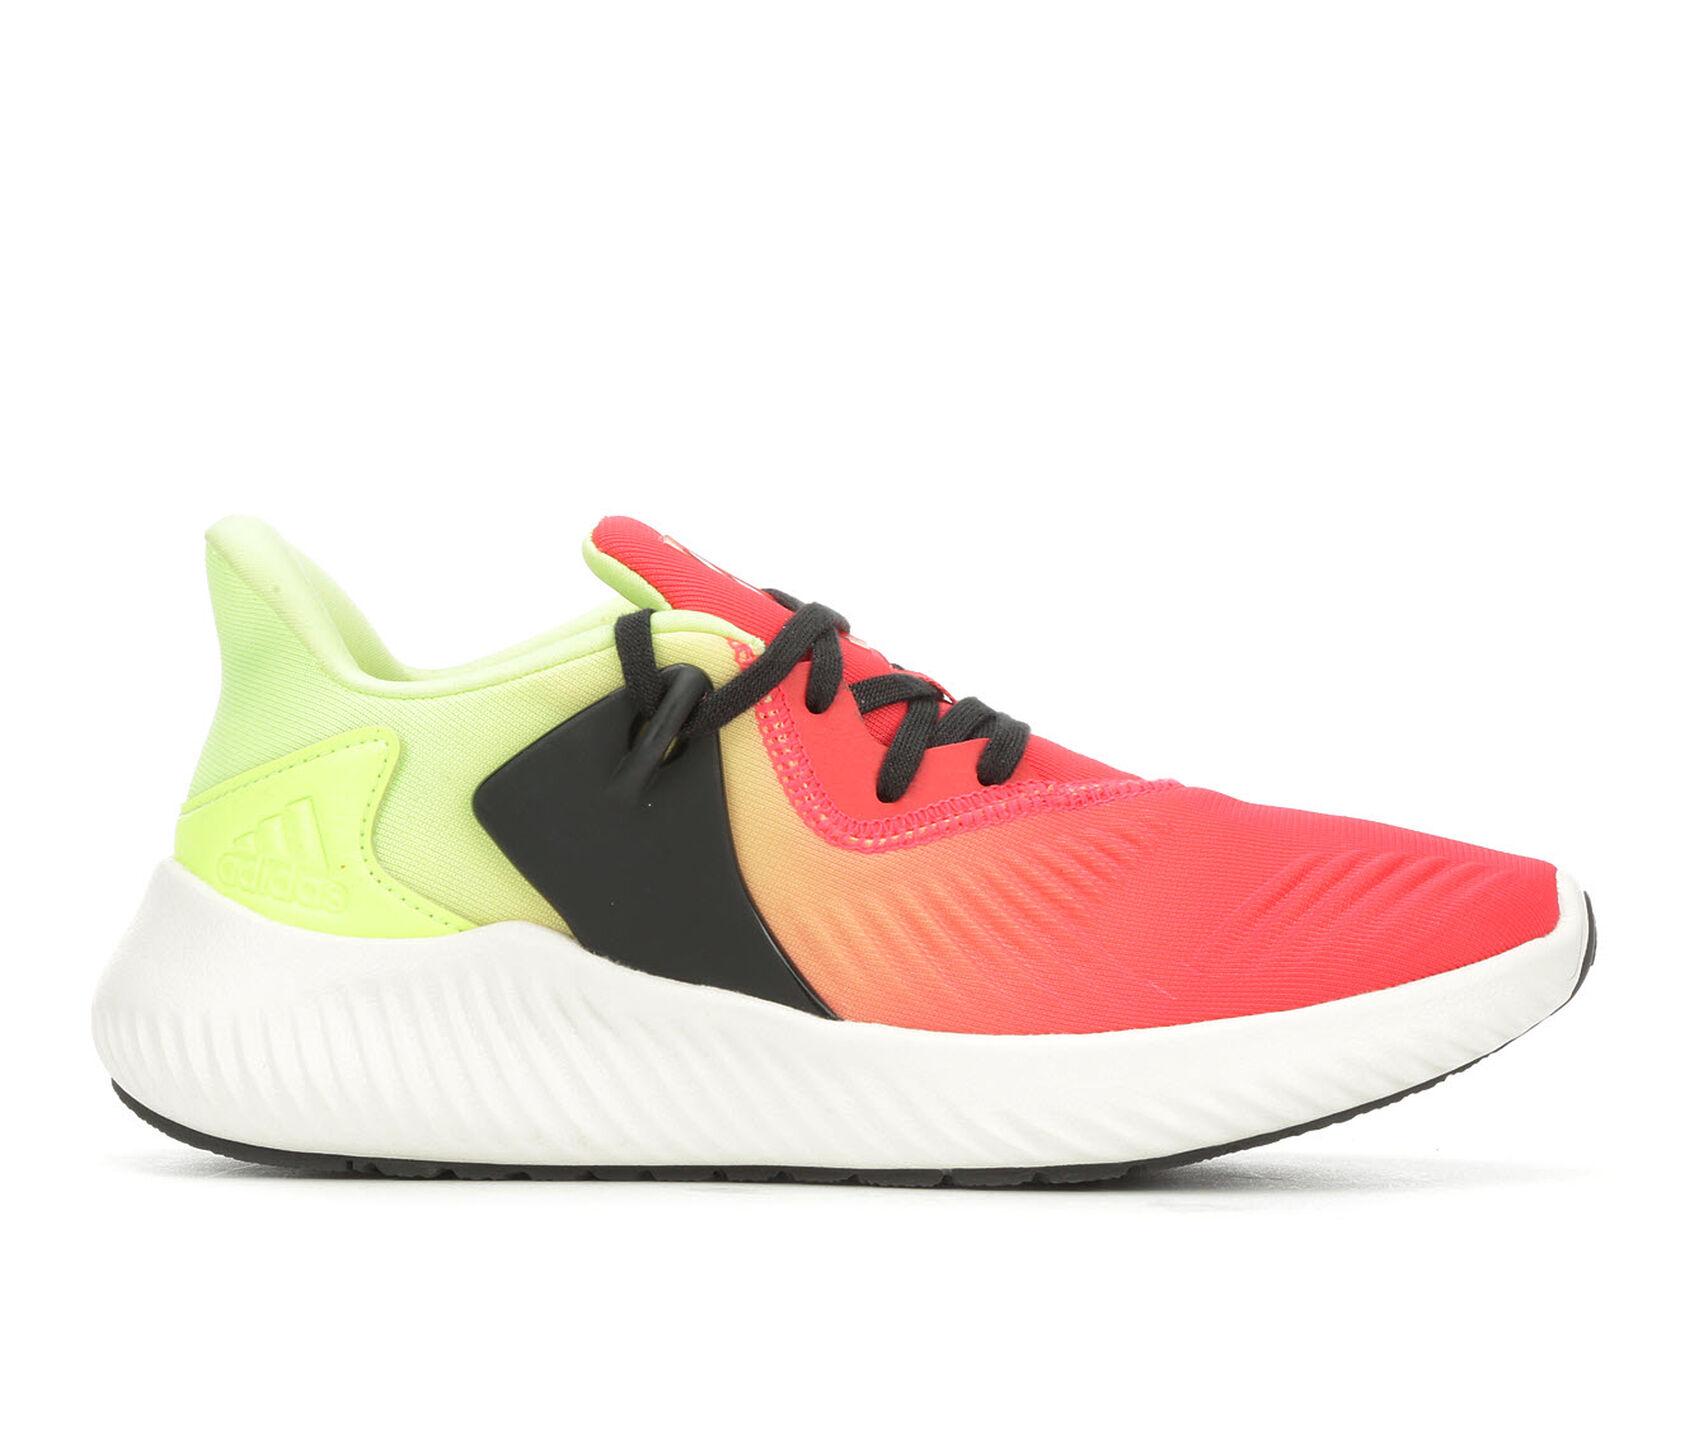 en soldes 2f330 dd46b Kids' Adidas Little Kid & Big Kid Alphabounce Running Shoes